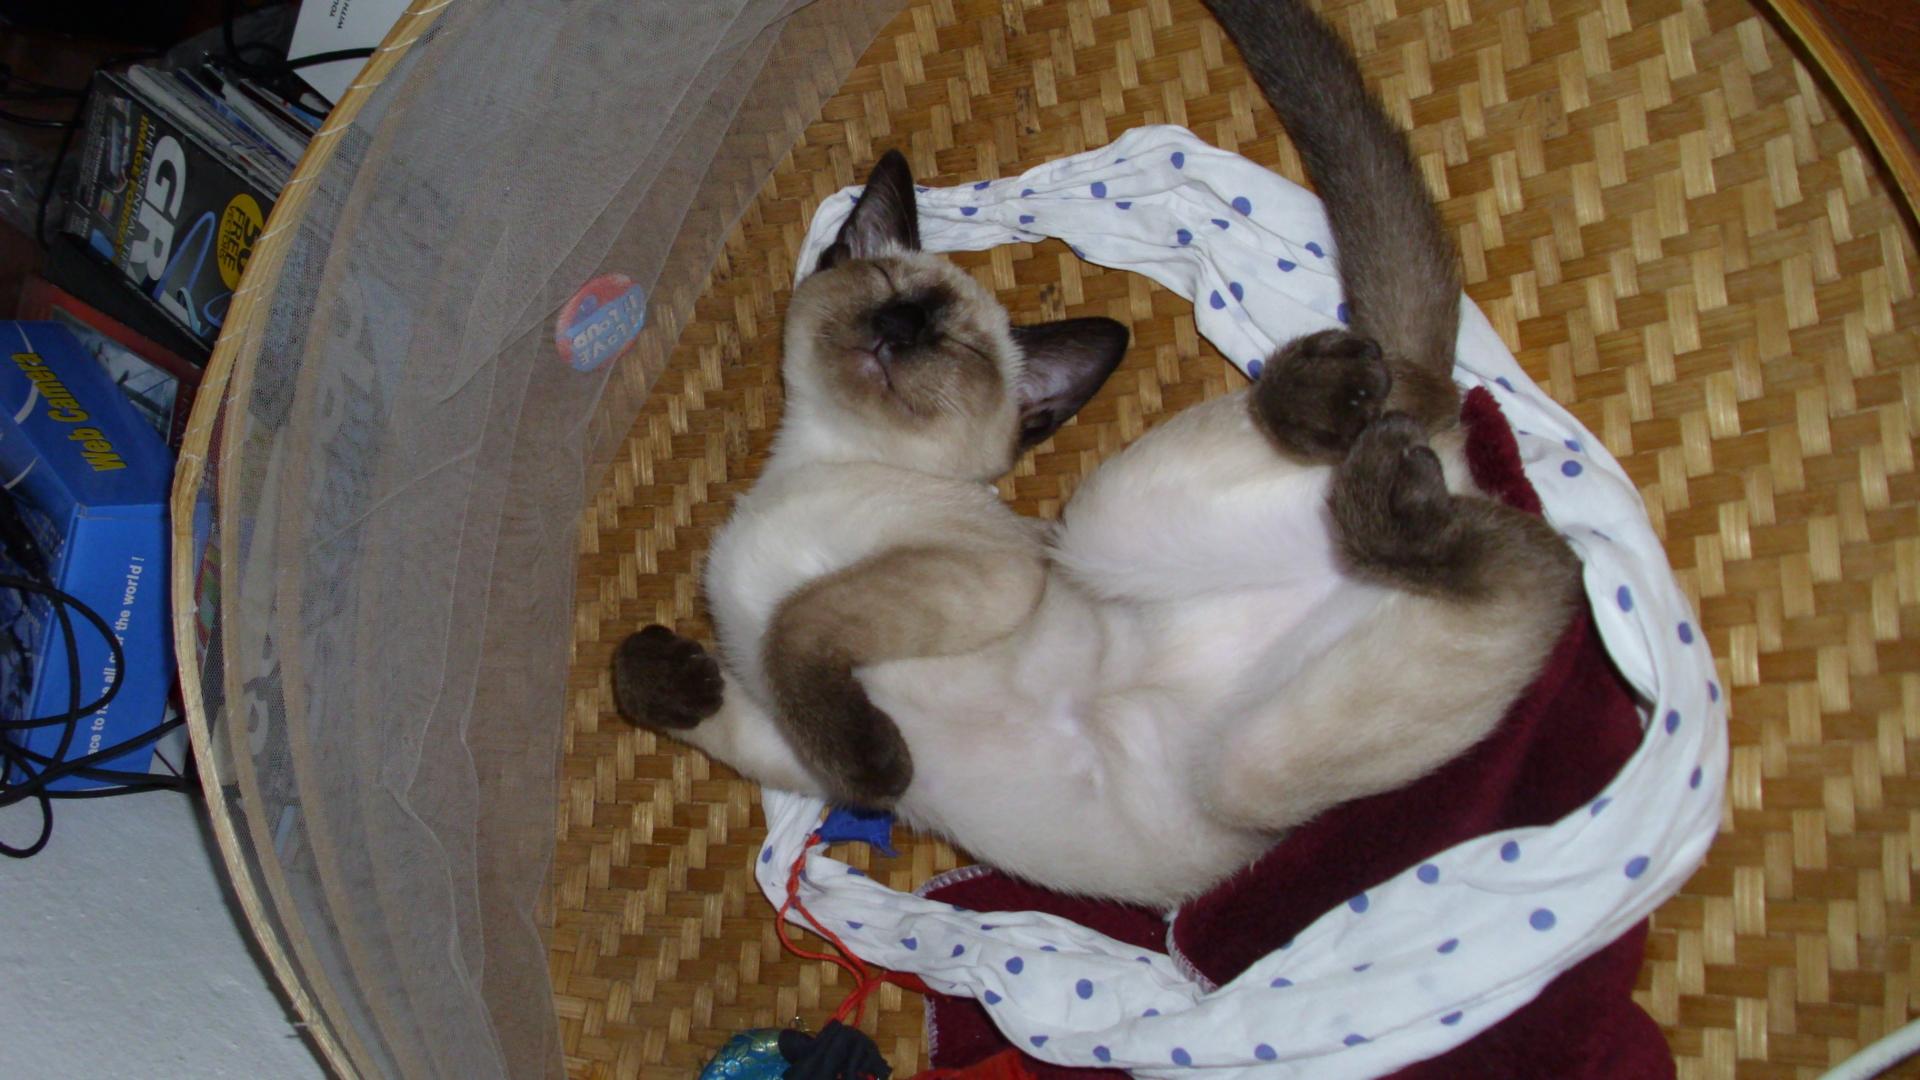 Serrade Petit Kitten: Serrade Most Playful Cat Breeds